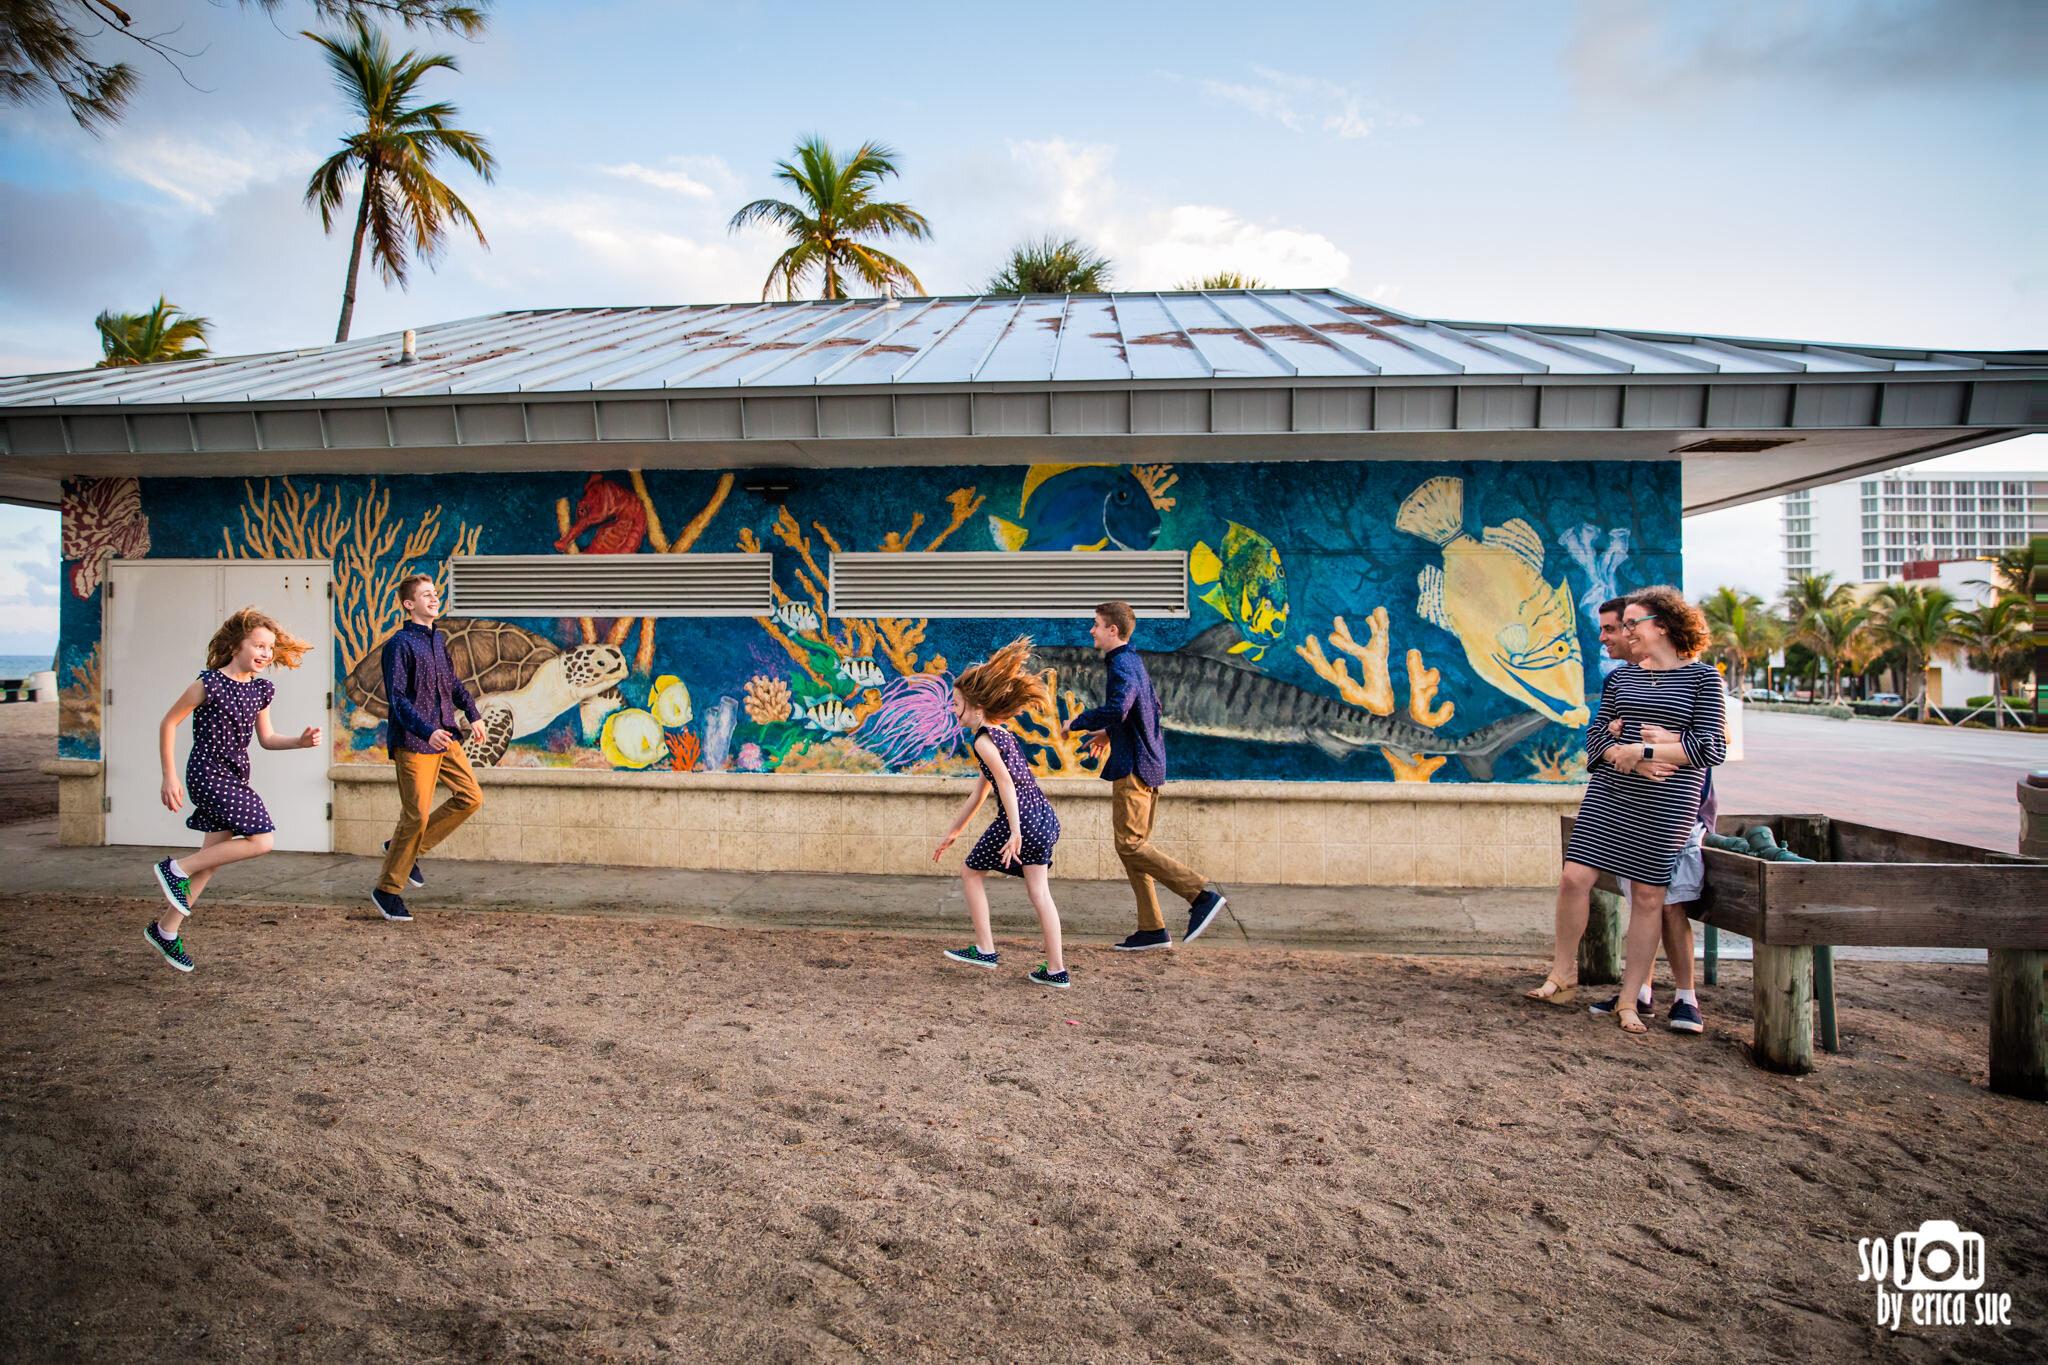 so-you-by-erica-sue-ft-lauderdale-beach-basketball-mitzvah-pre-shoot--7.JPG